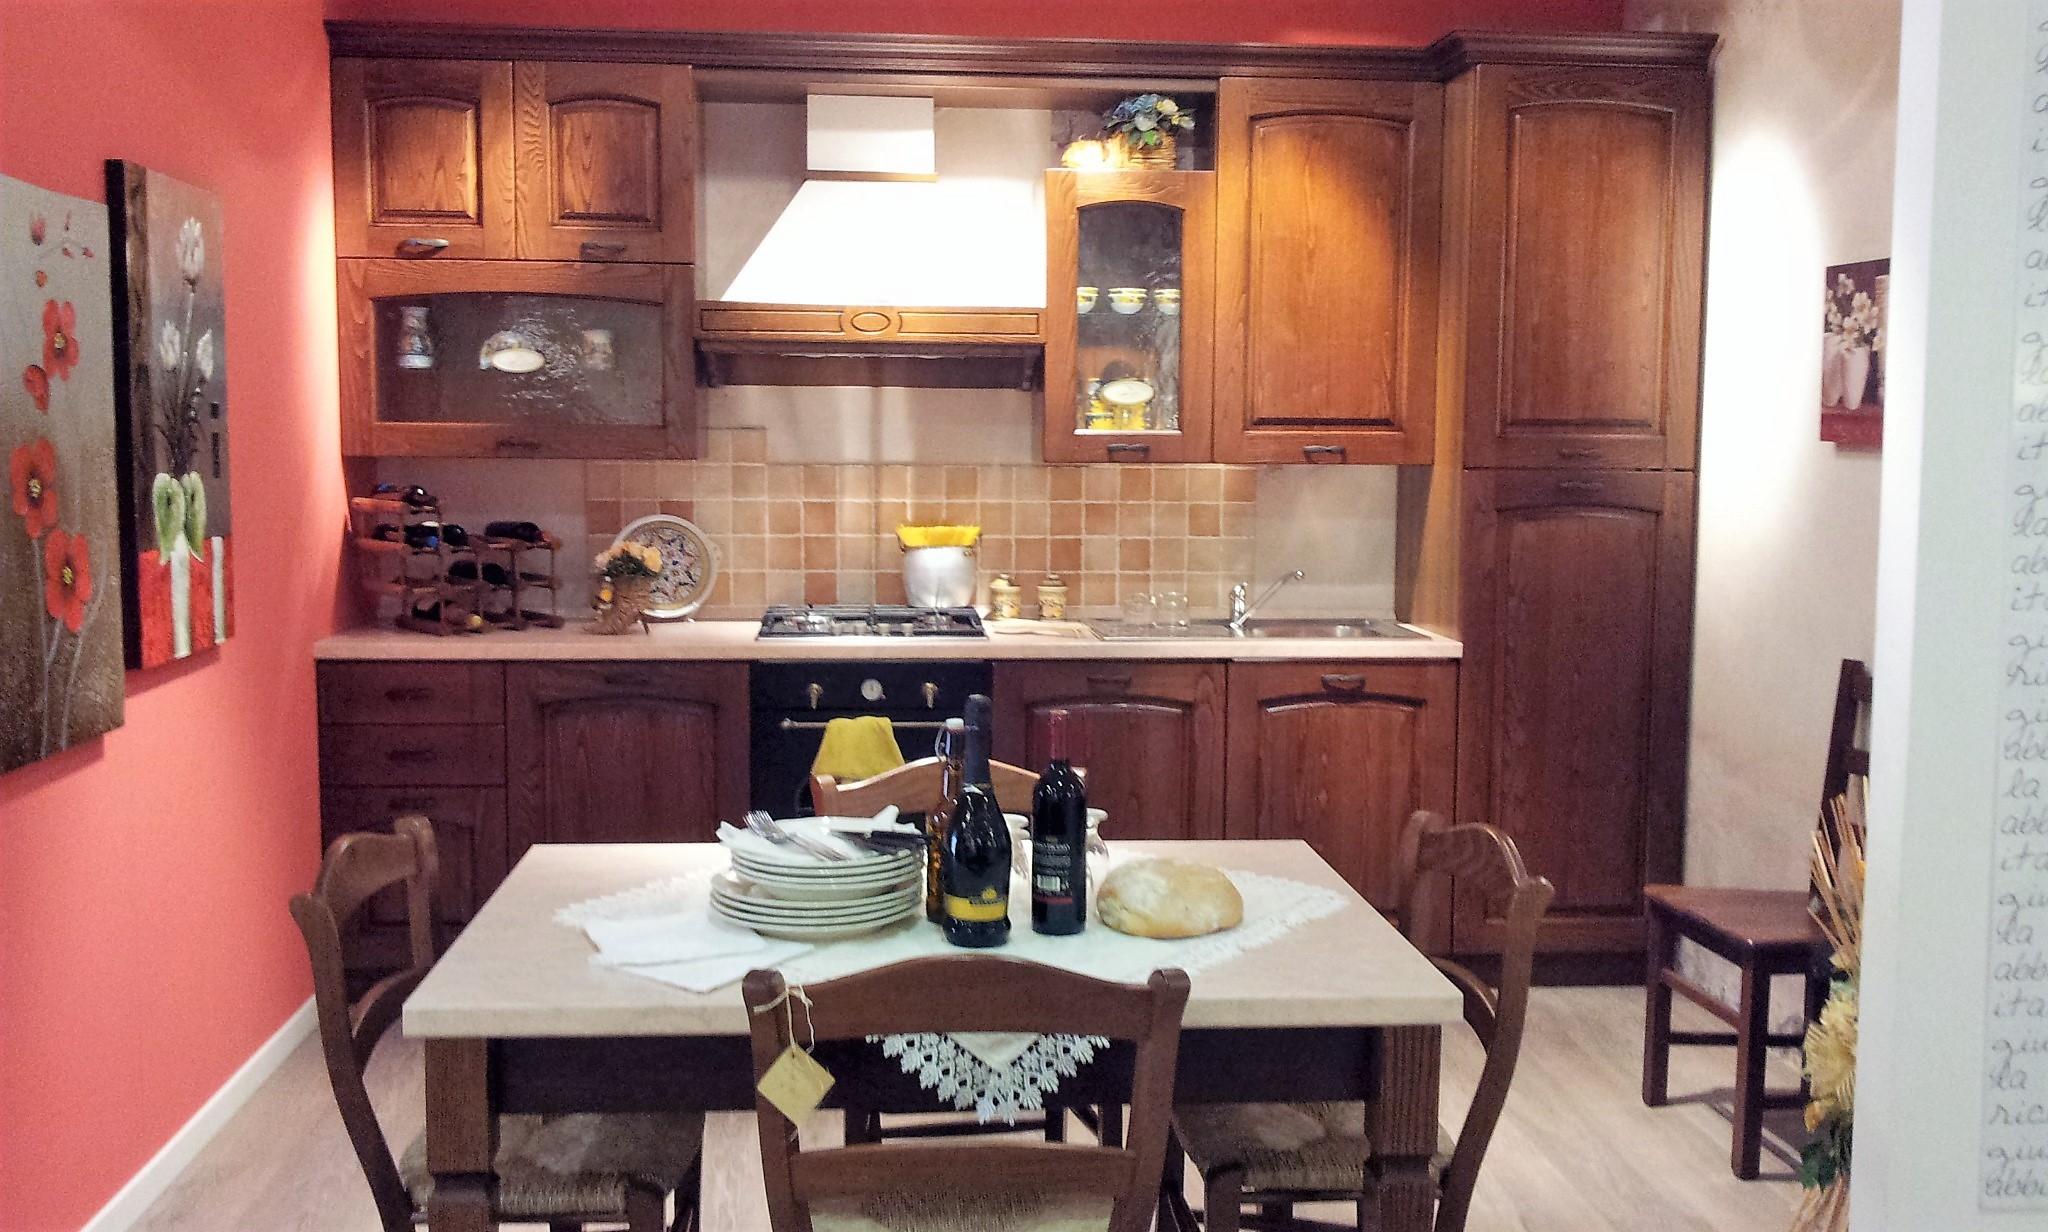 Cucina classica in noce stosa cucine focolare a prezzo - Foto di cucine ...